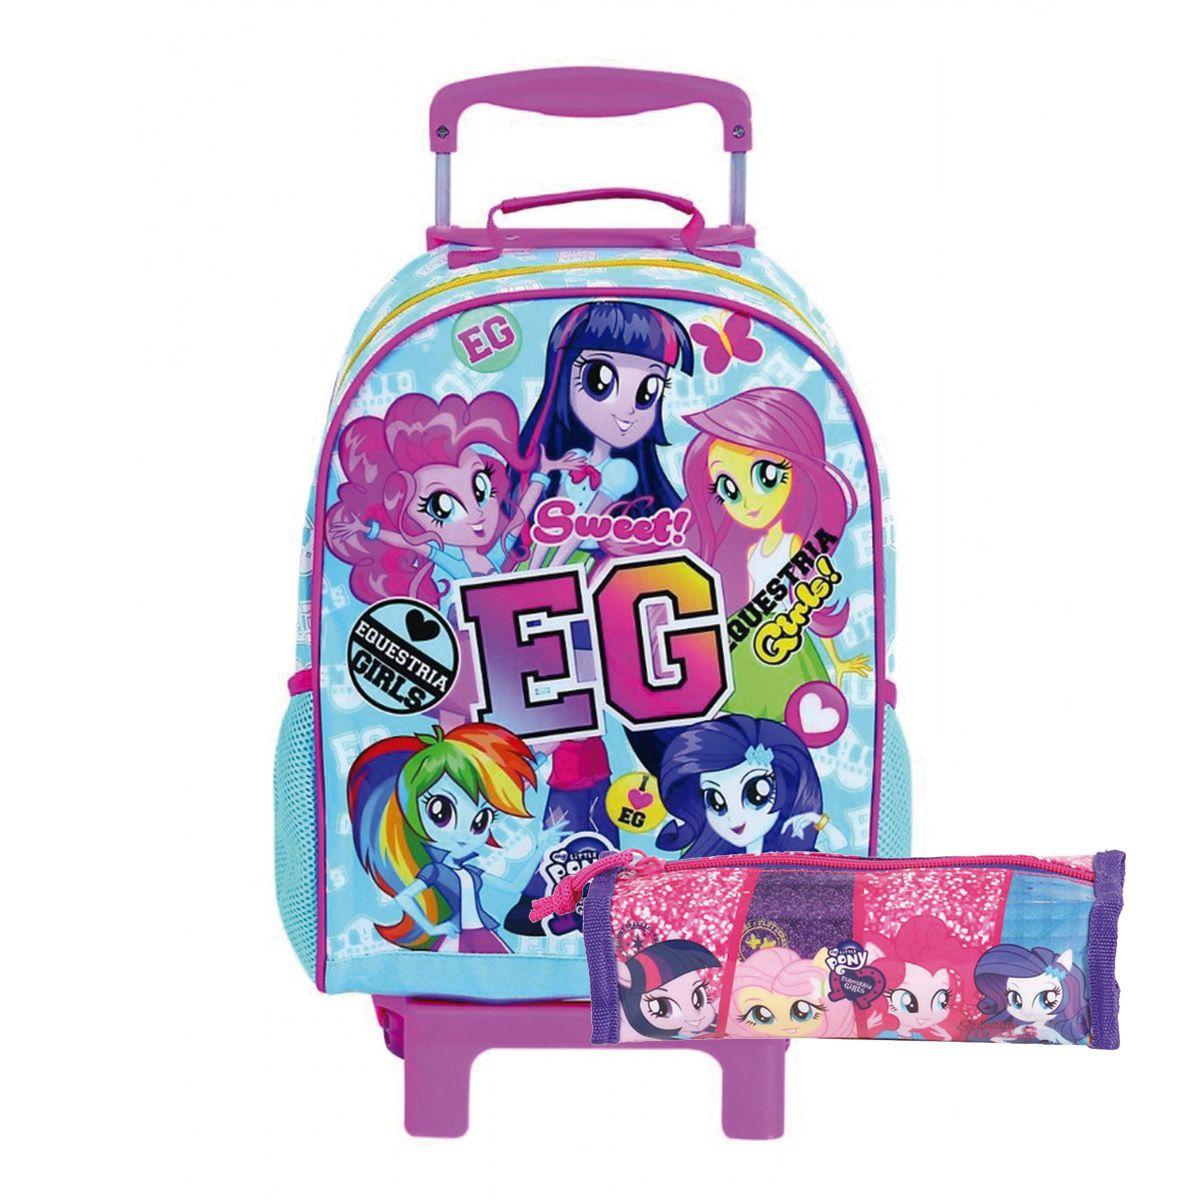 Kit Mochilete c/ Rodinha My Little Pony Equestria Girls c/ estojo Oficial